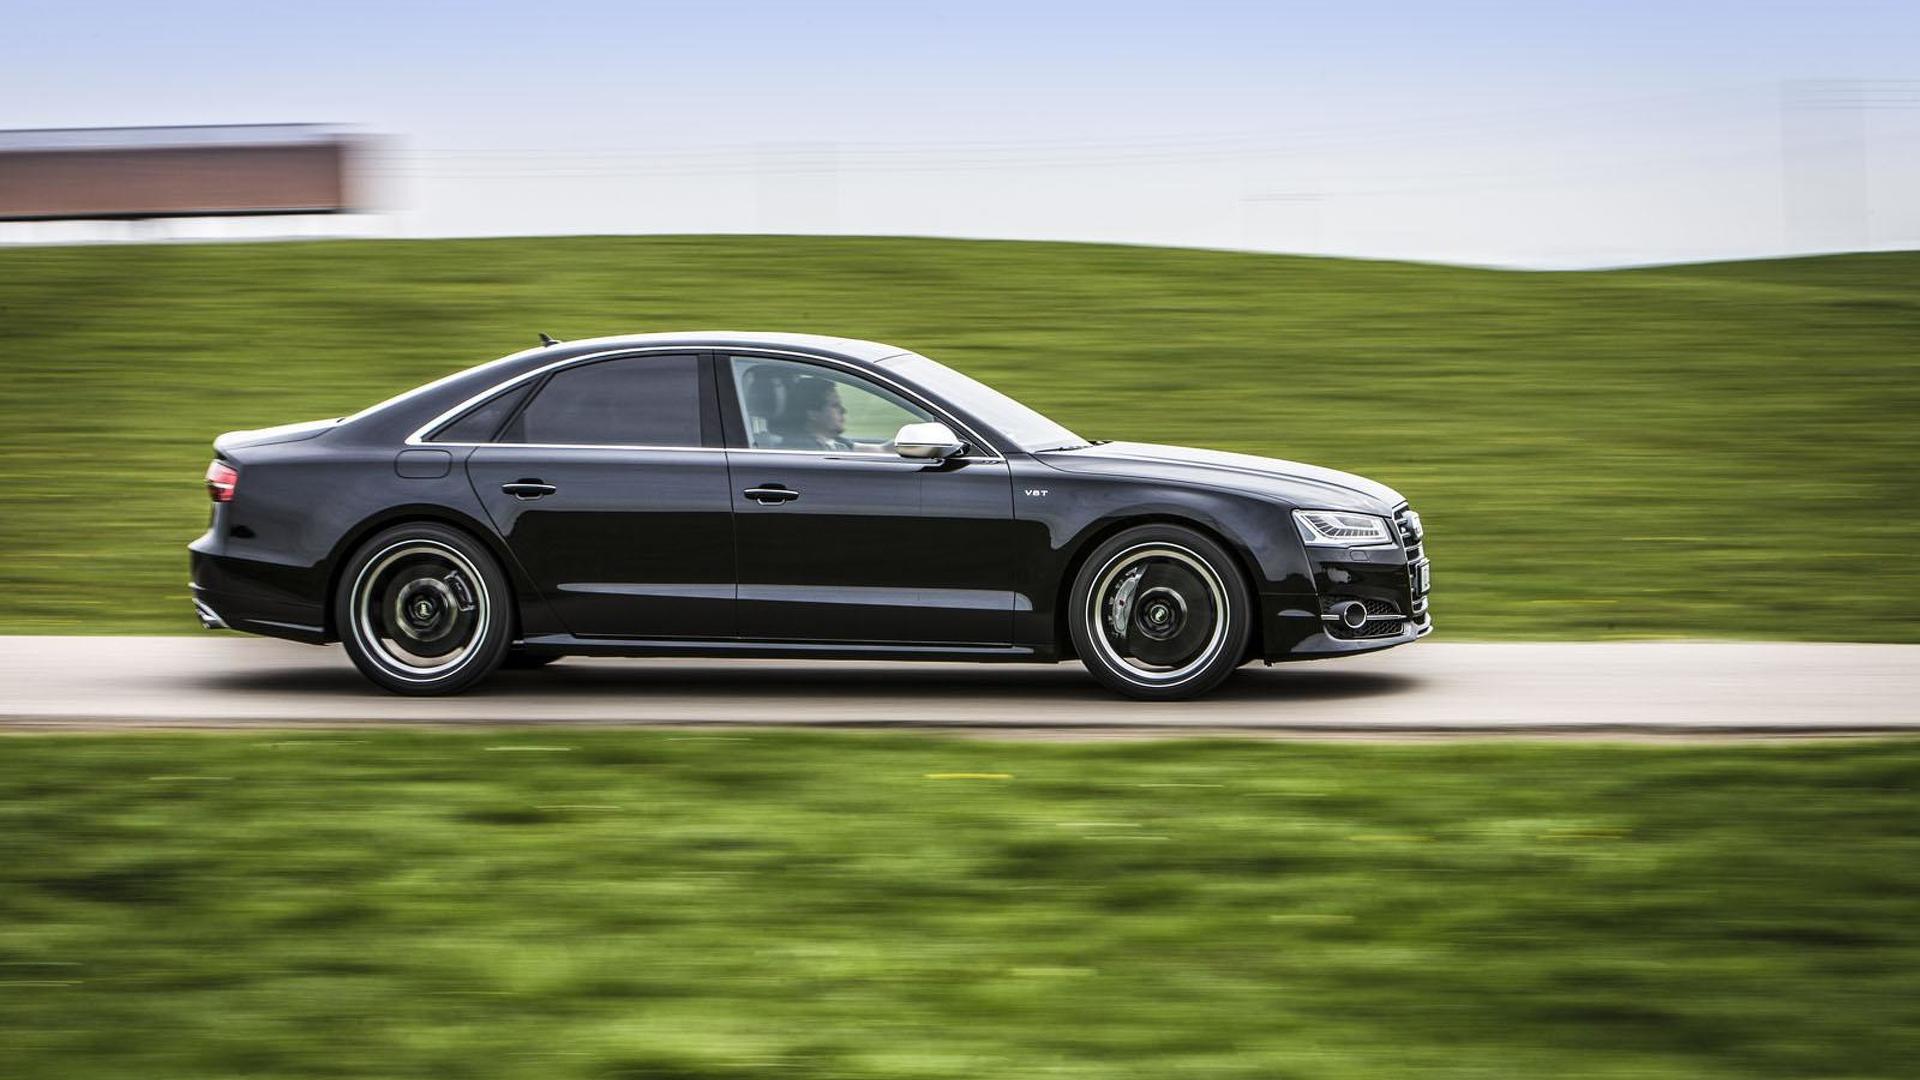 Чёрный седан Audi S8. Тюнинг от ABT Sportsline